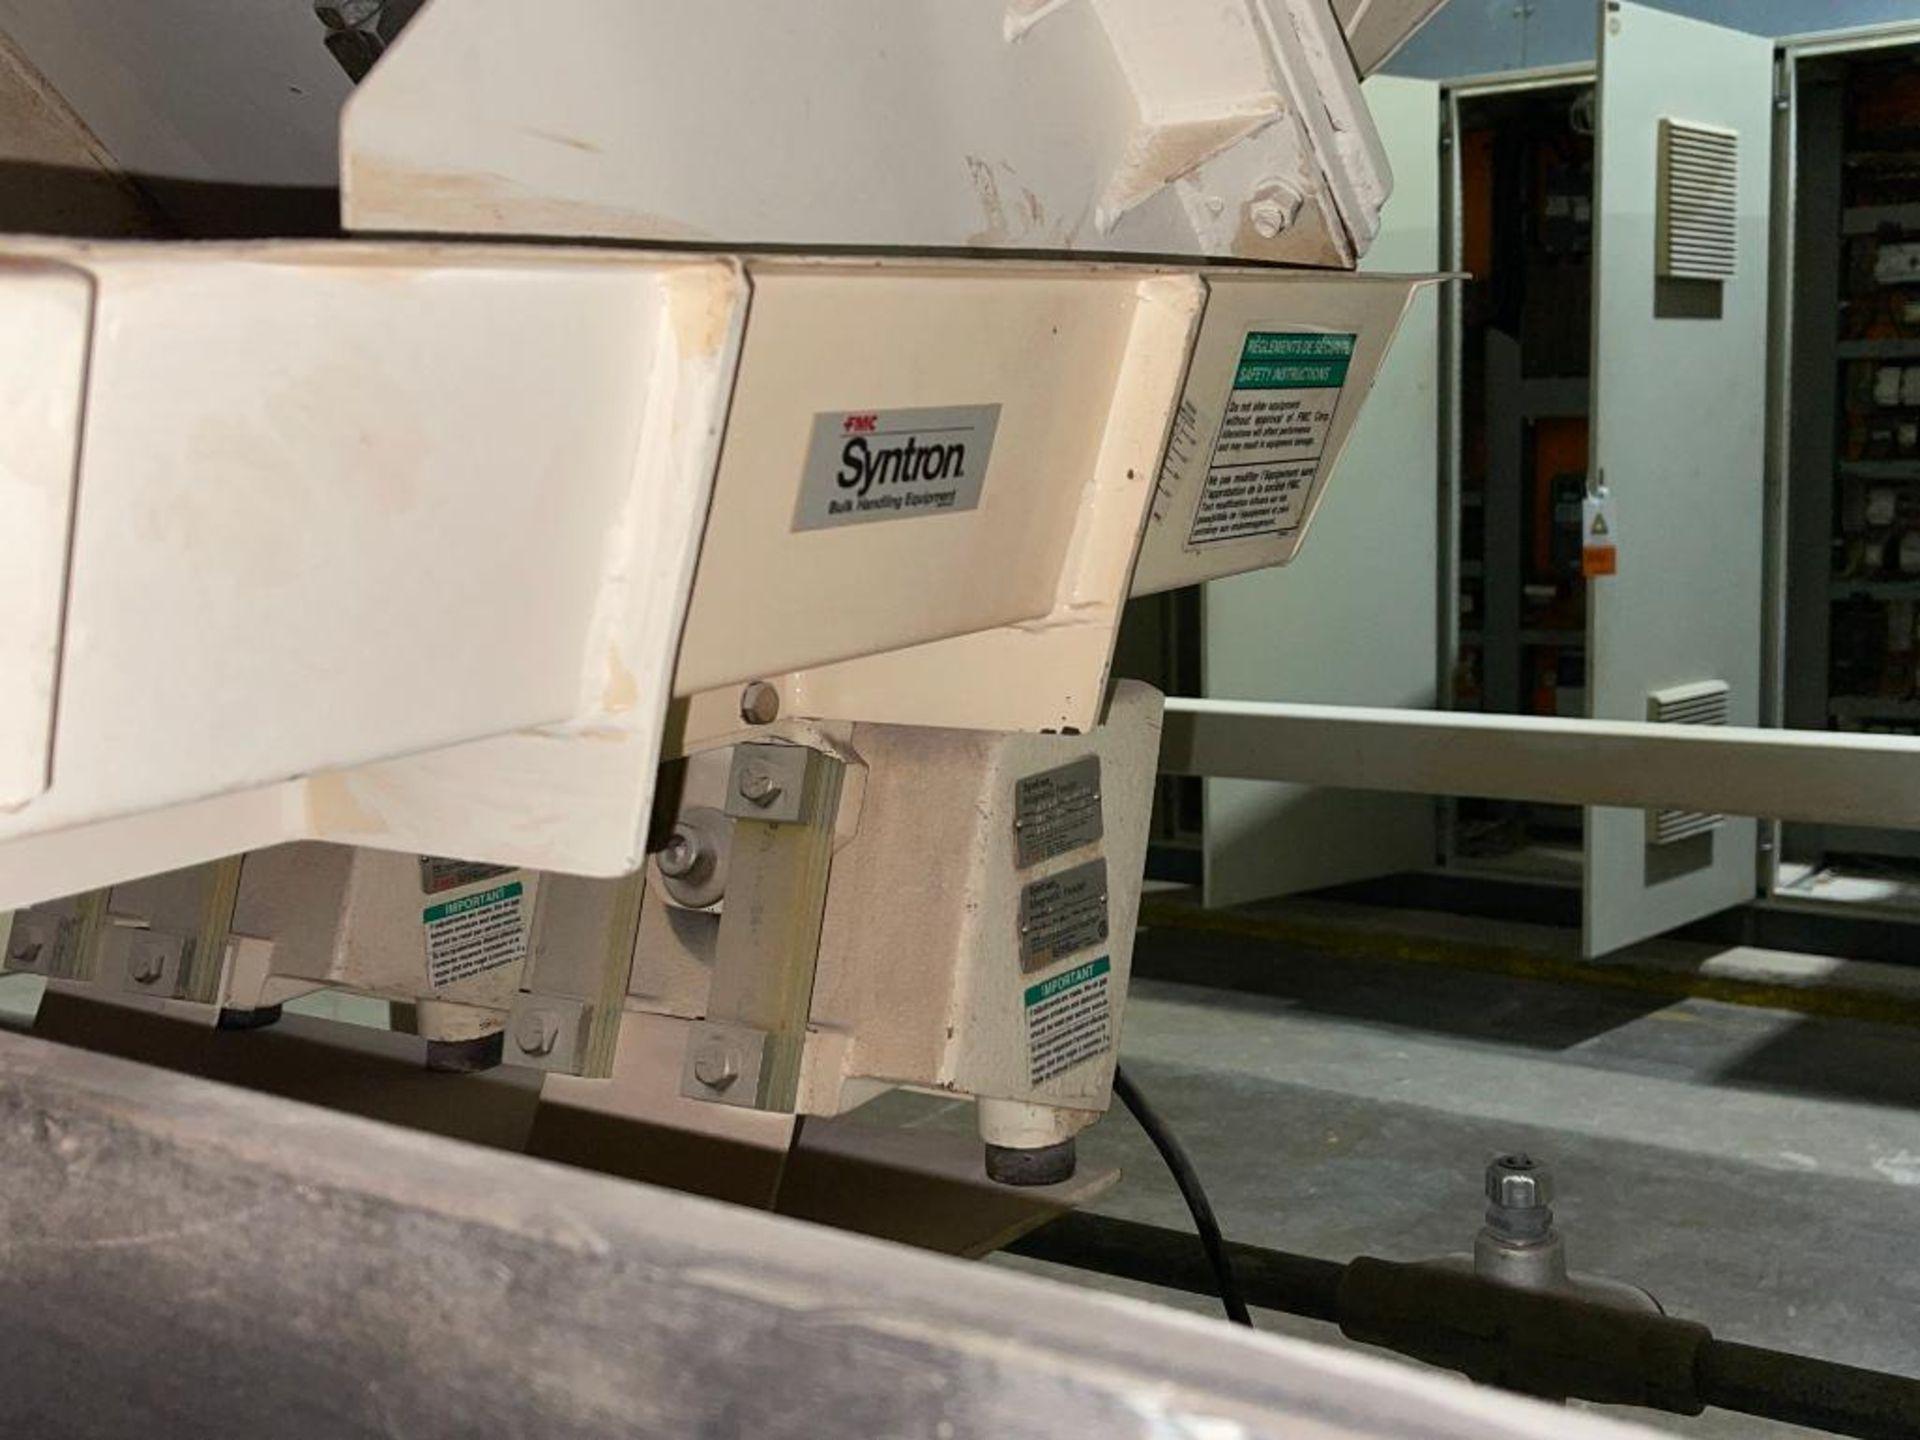 Aseeco mild steel cone bottom bulk storage bin - Image 24 of 28